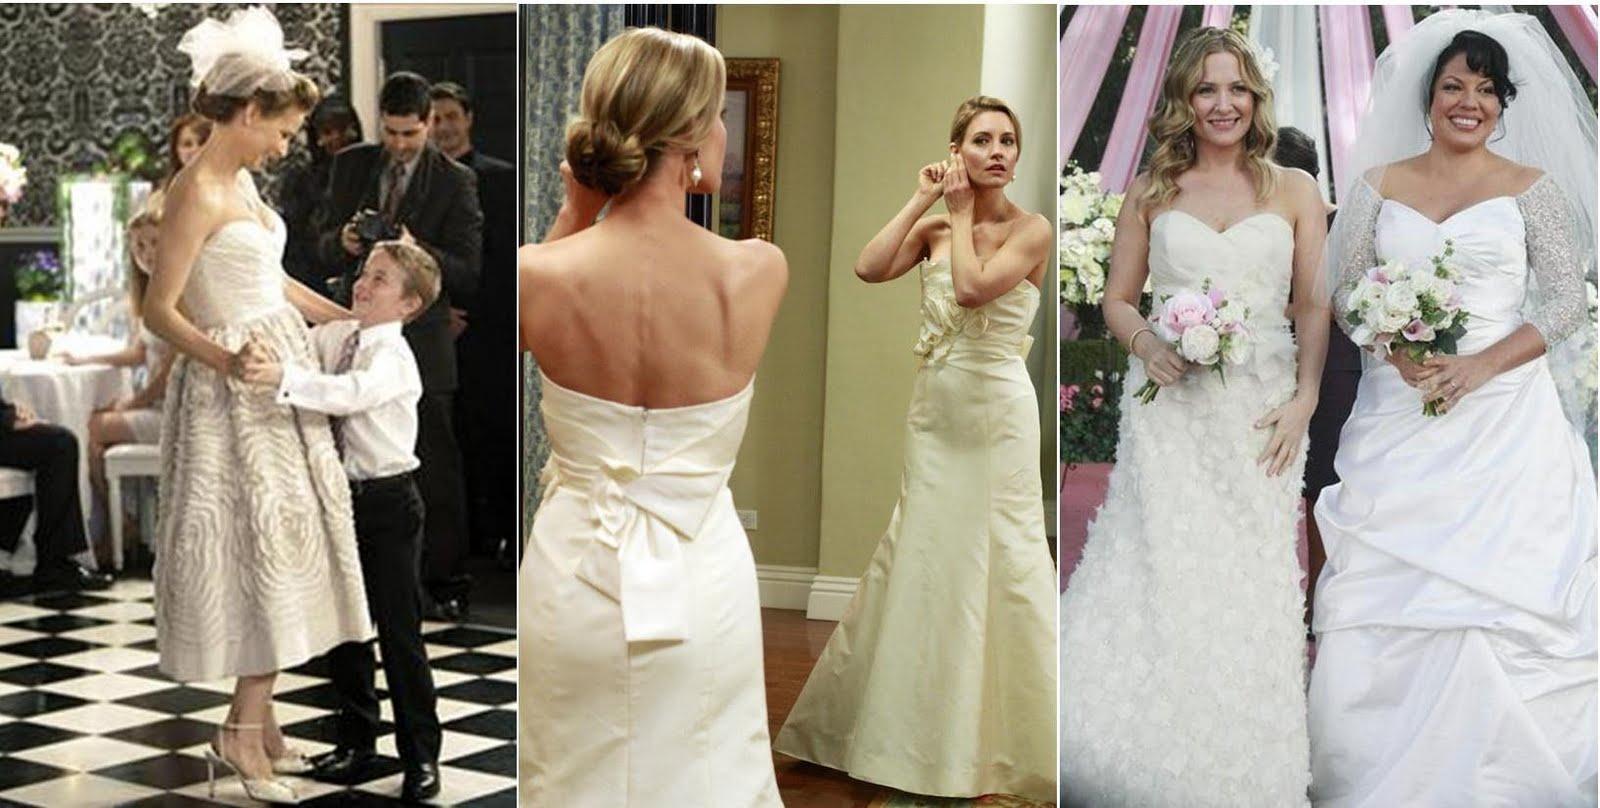 wedding dresses tv shows photo - 1